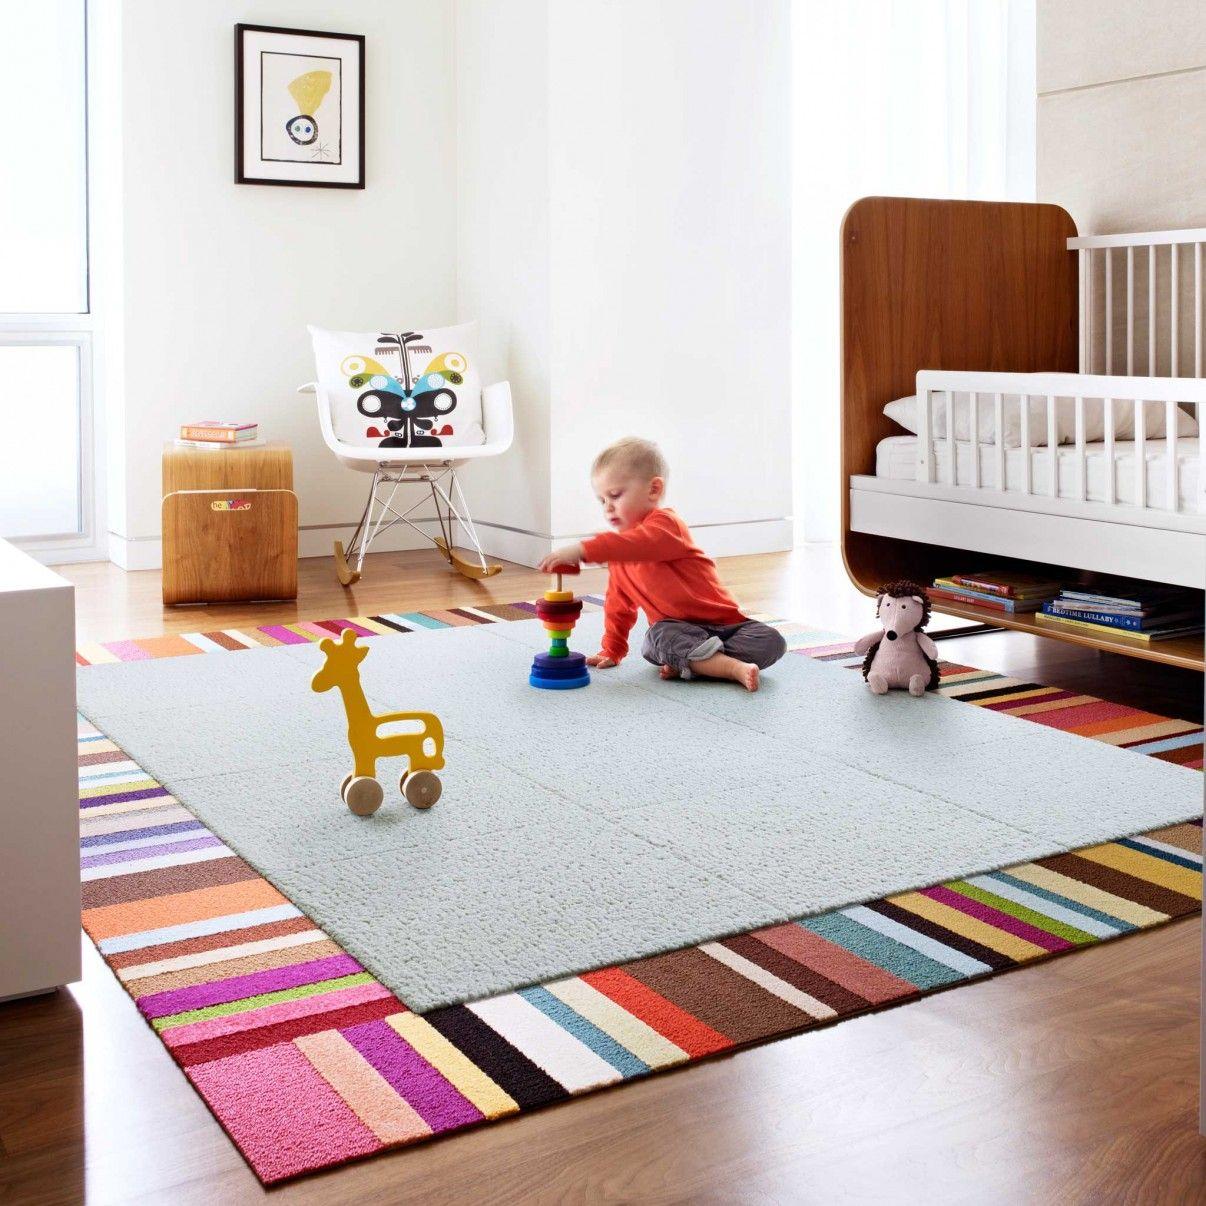 Parallel Reality Kids Room Carpet Squares Carpet Tiles